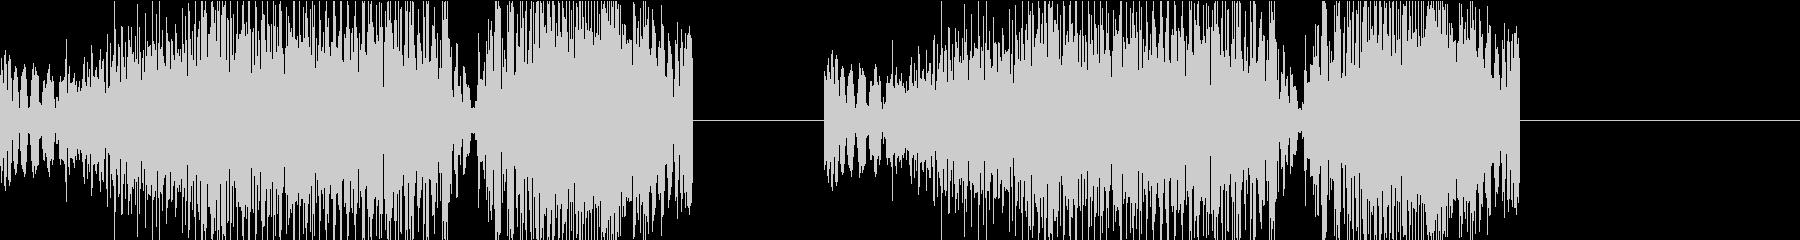 DJプレイ スクラッチ・ノイズ 313の未再生の波形